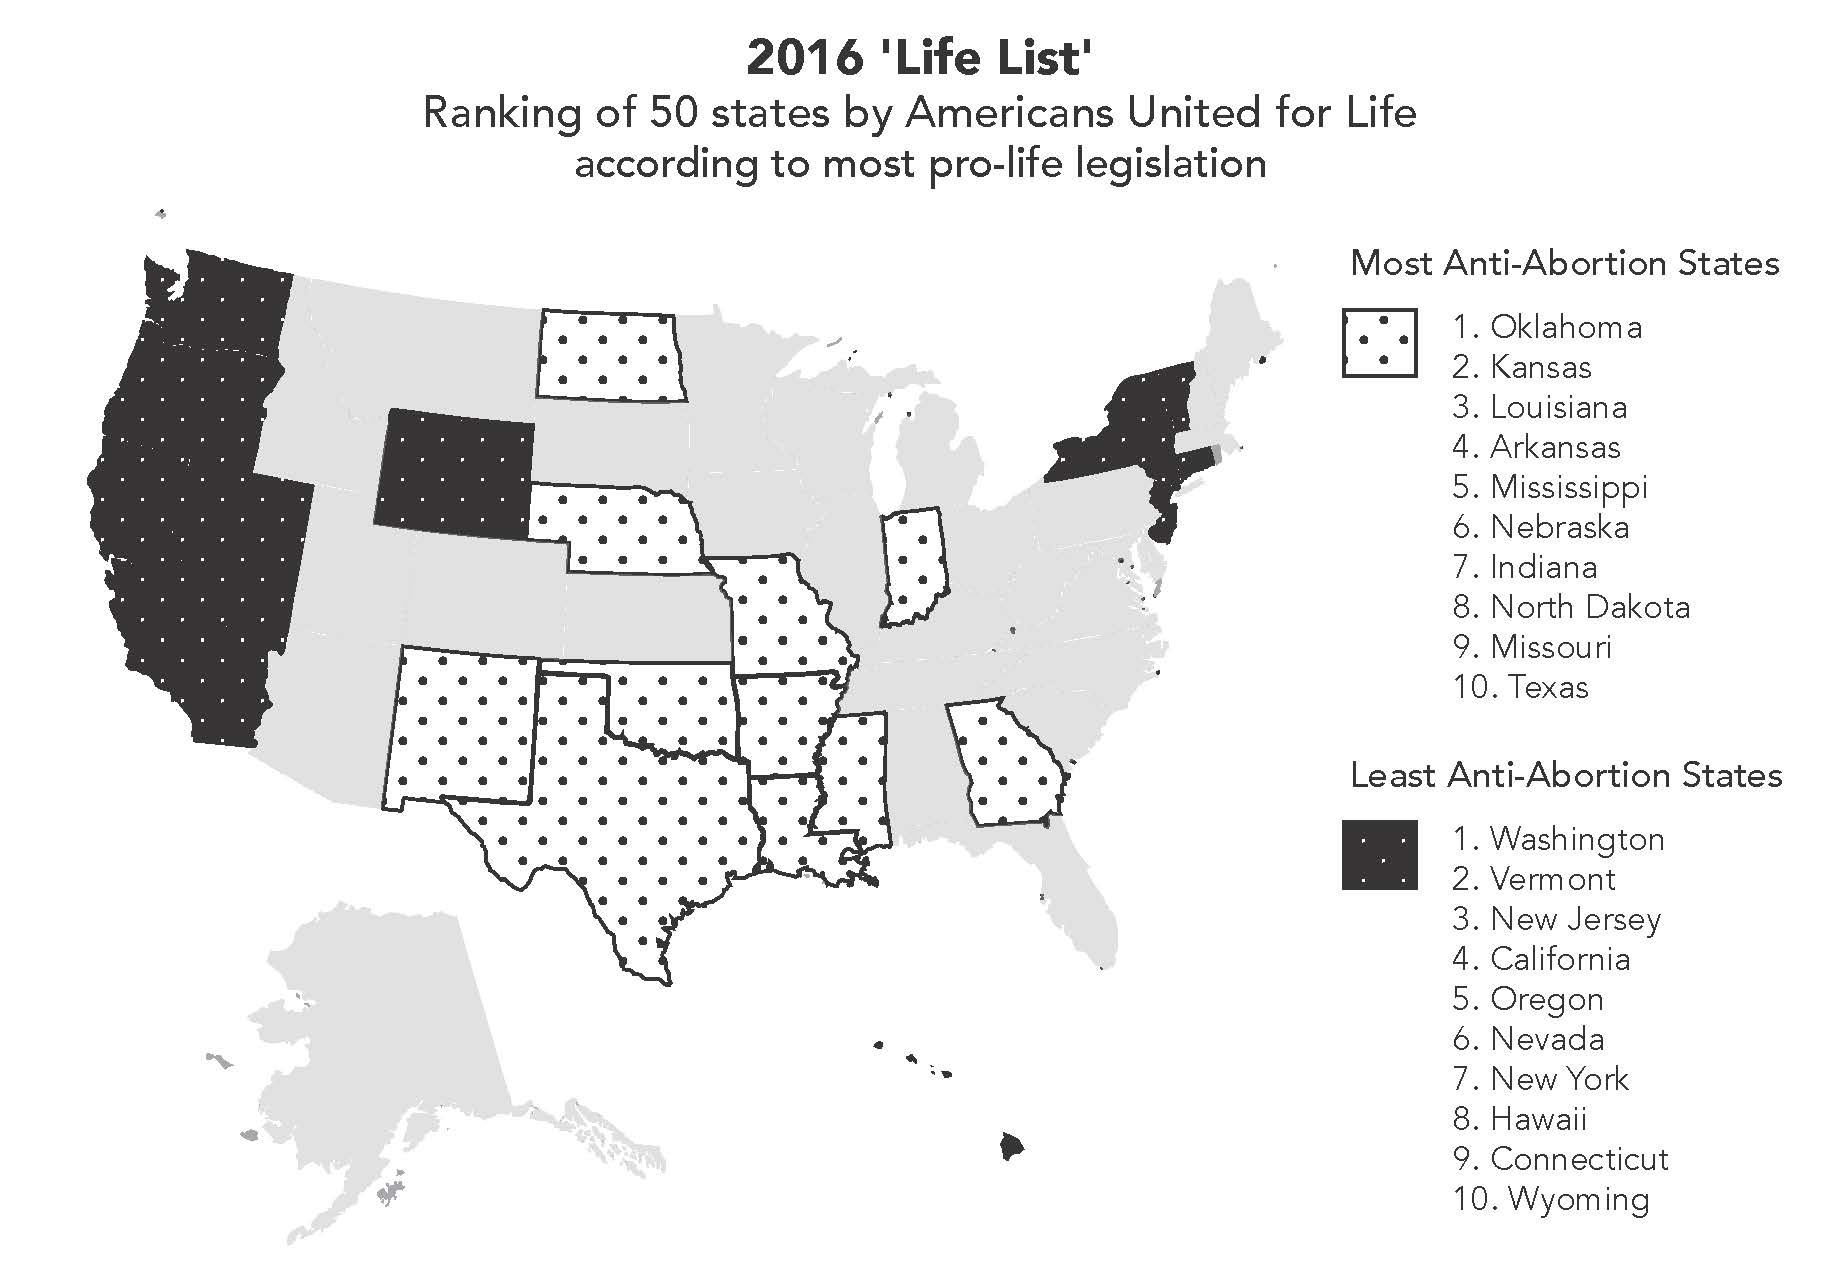 Arkansas ranked No. 4 on anti-abortion list